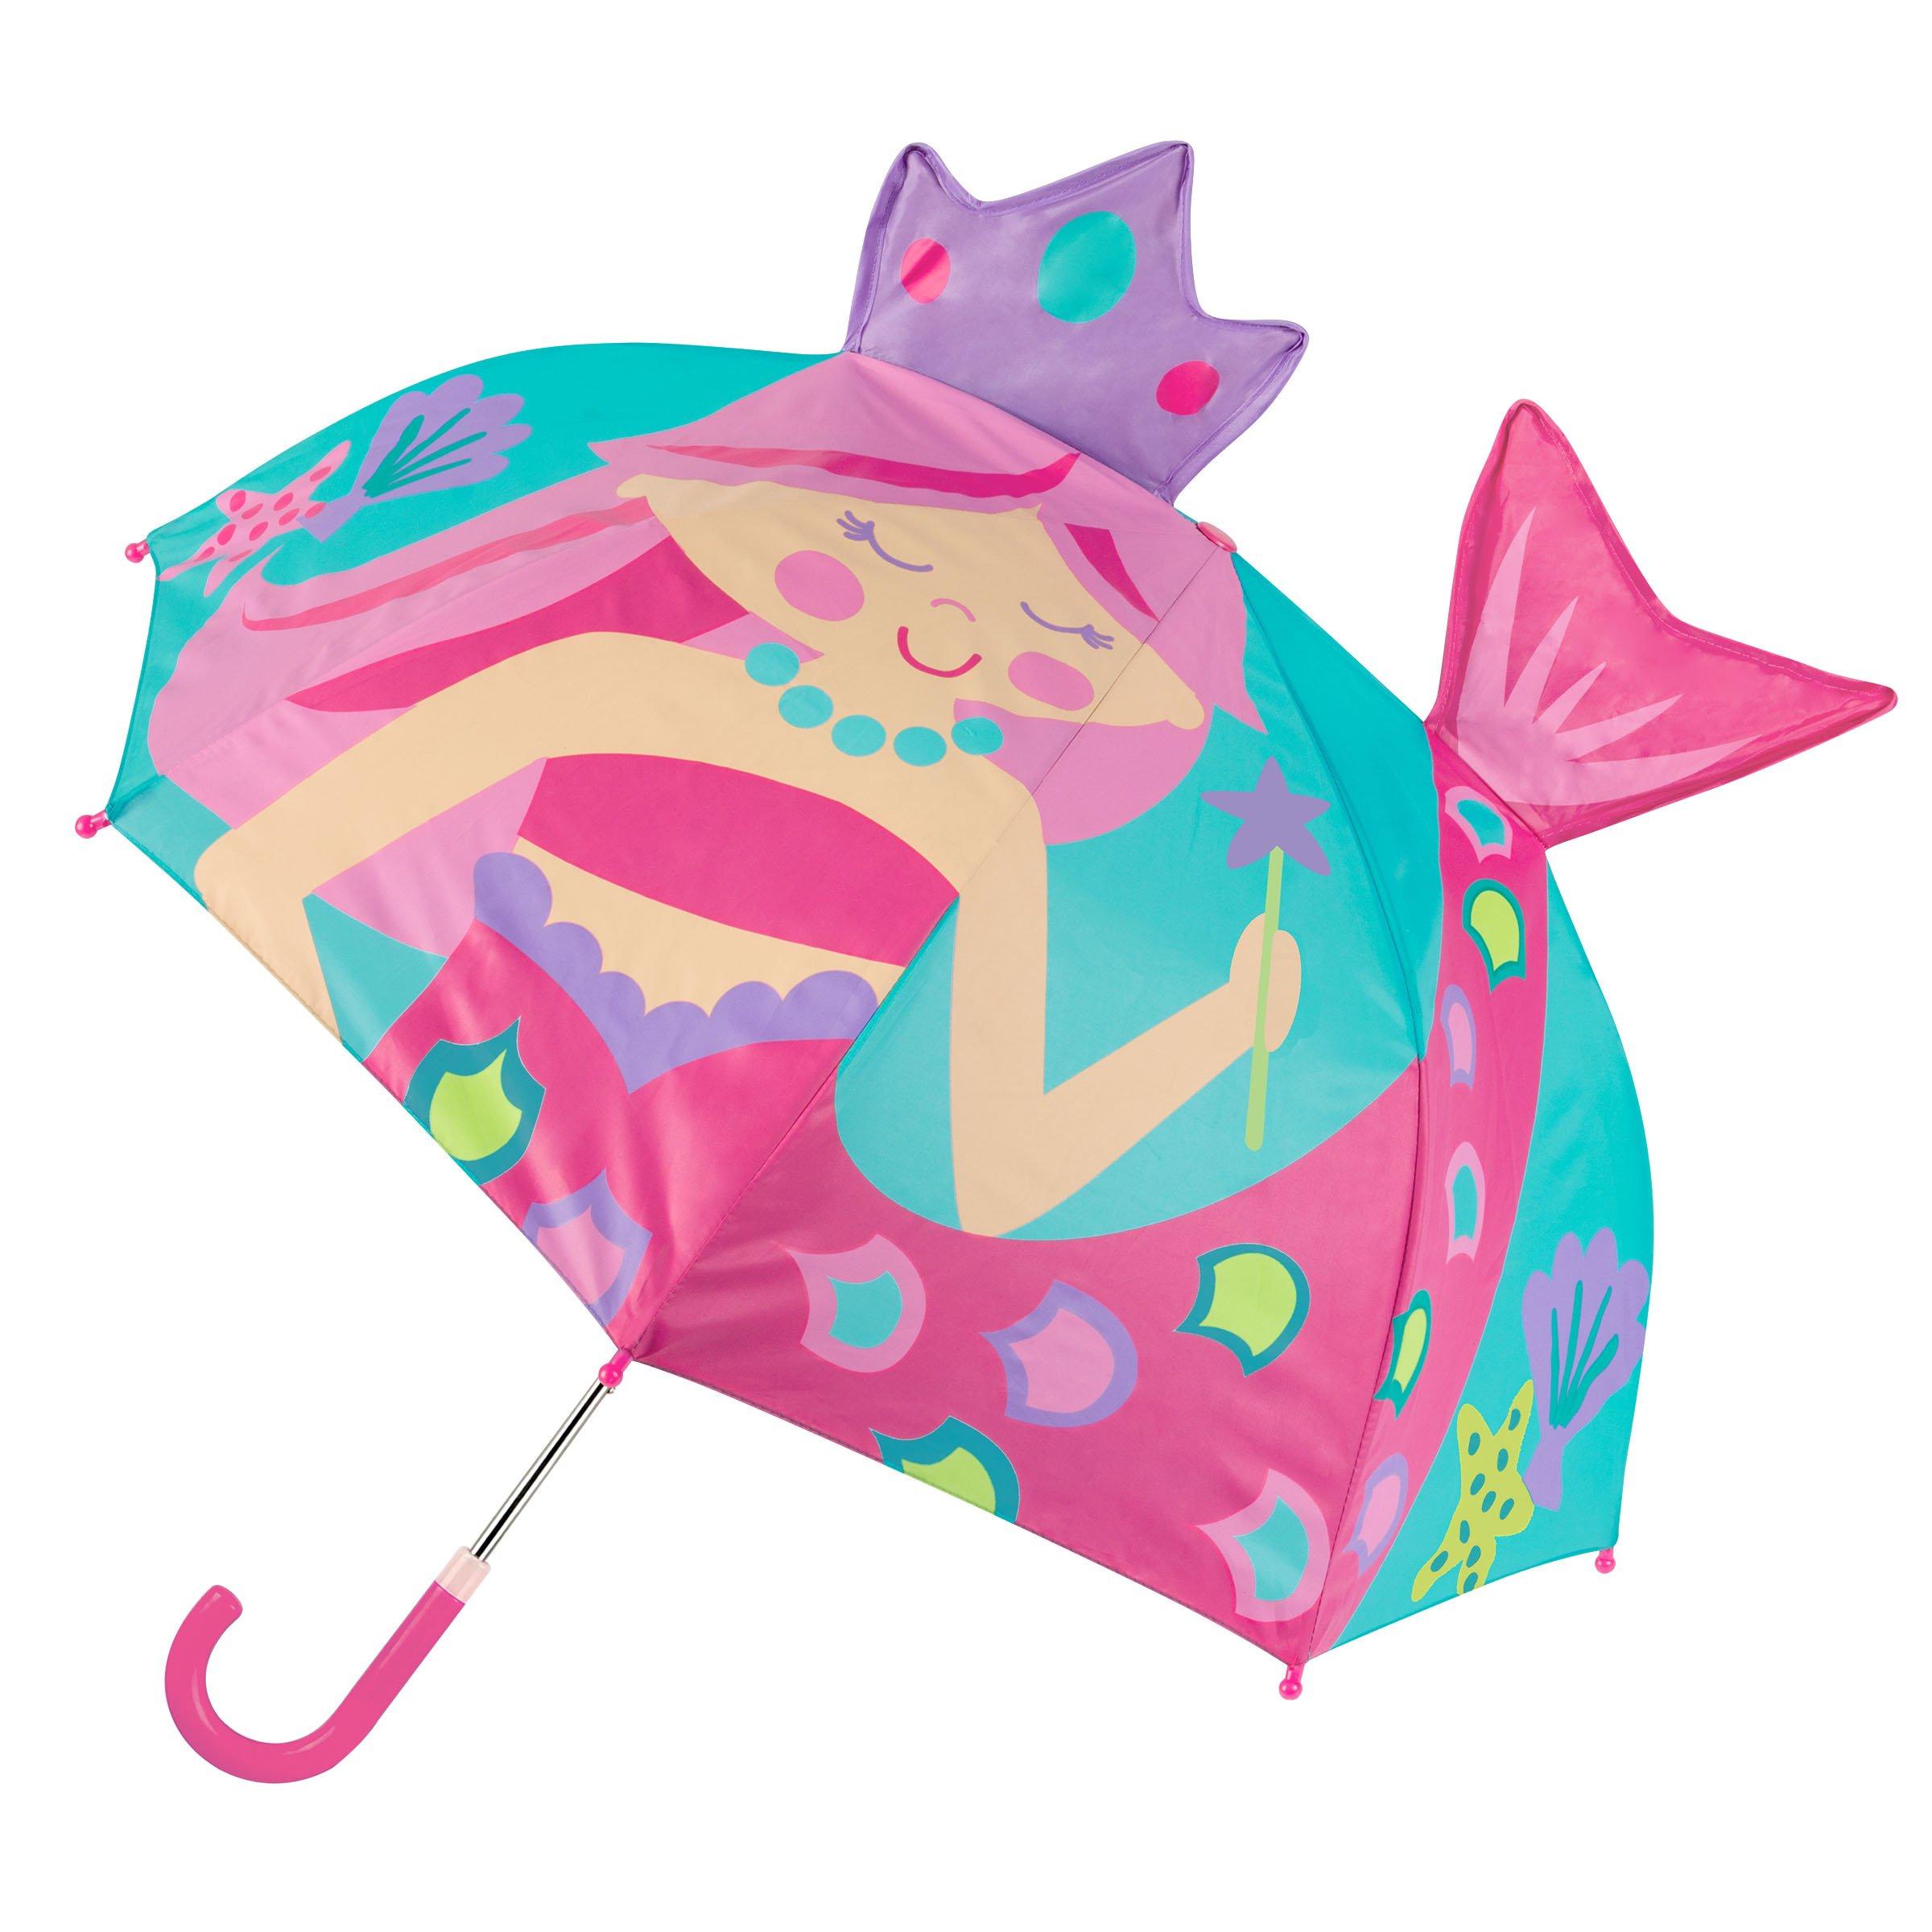 Stephen Joseph Pop Up Umbrella, Pink Mermaid